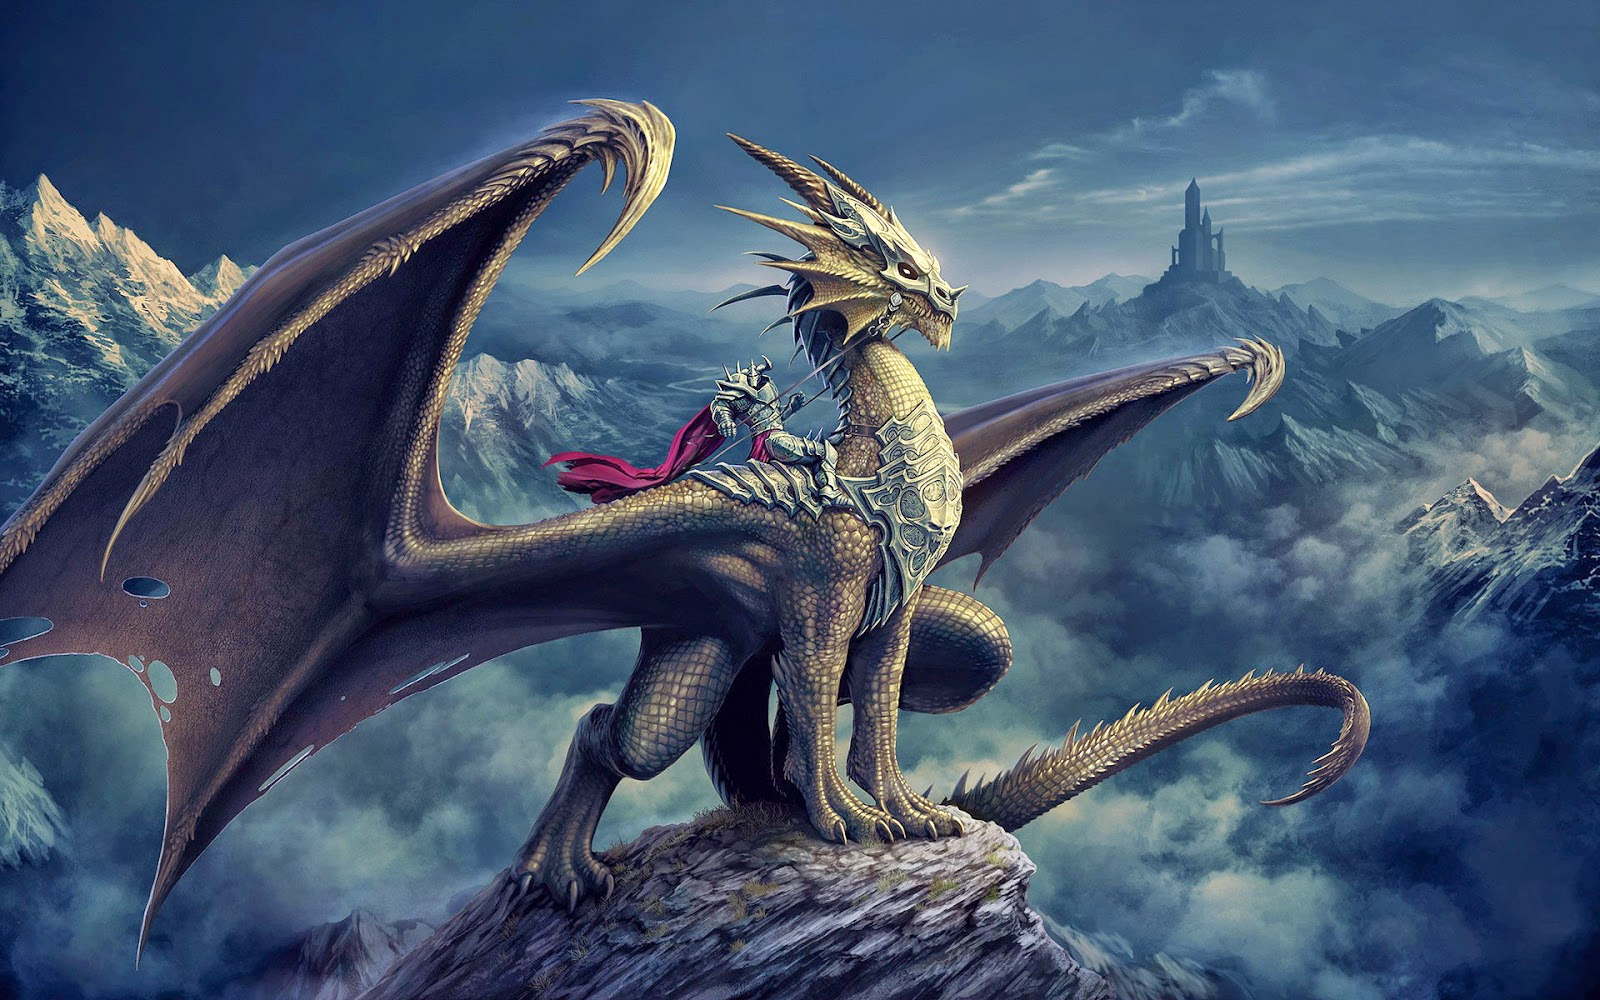 daemon targaryen and his dragon Caraxes